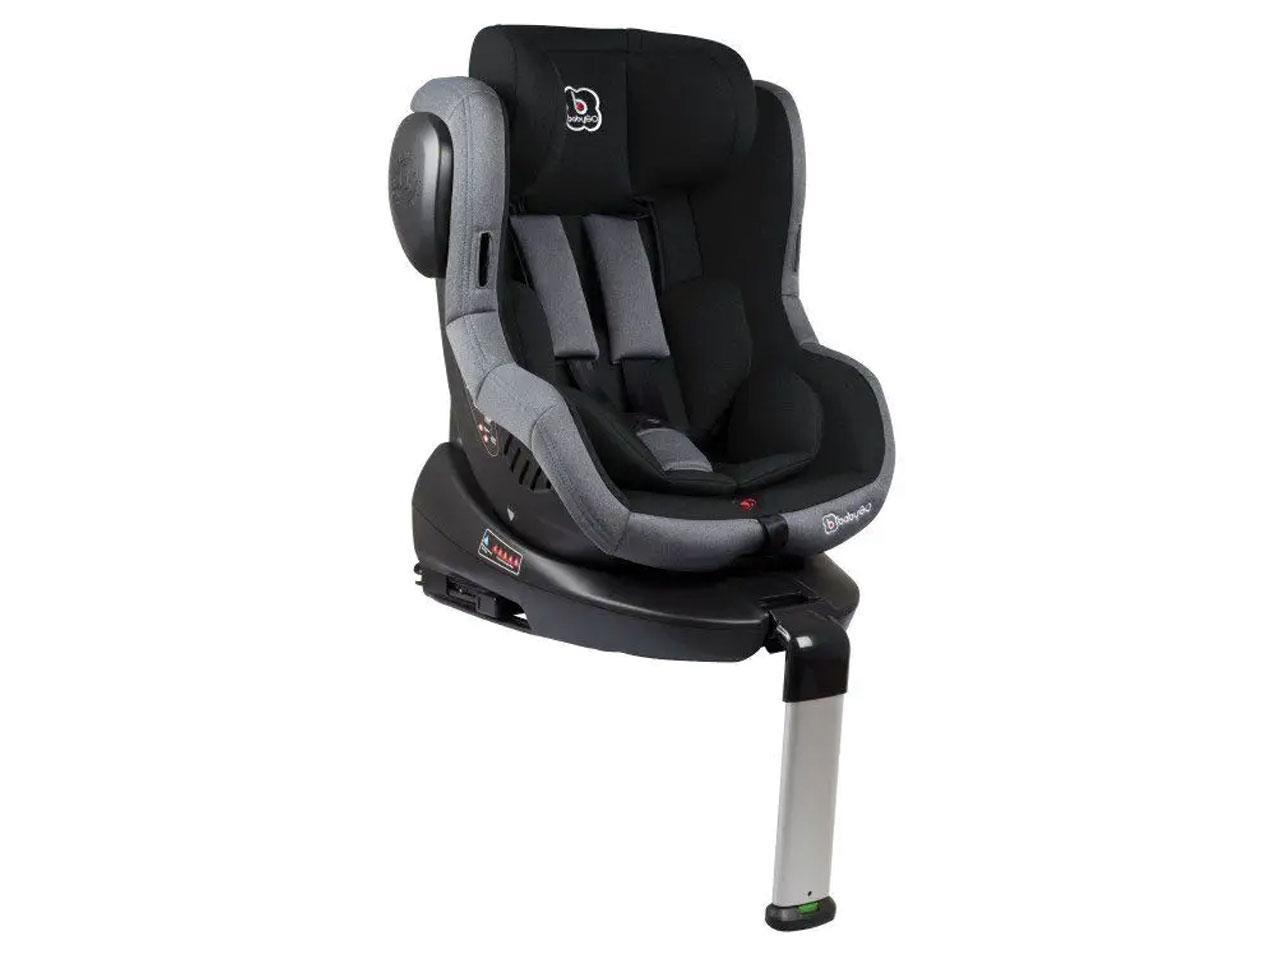 Autosedačka BABYGO ISO 360, černá